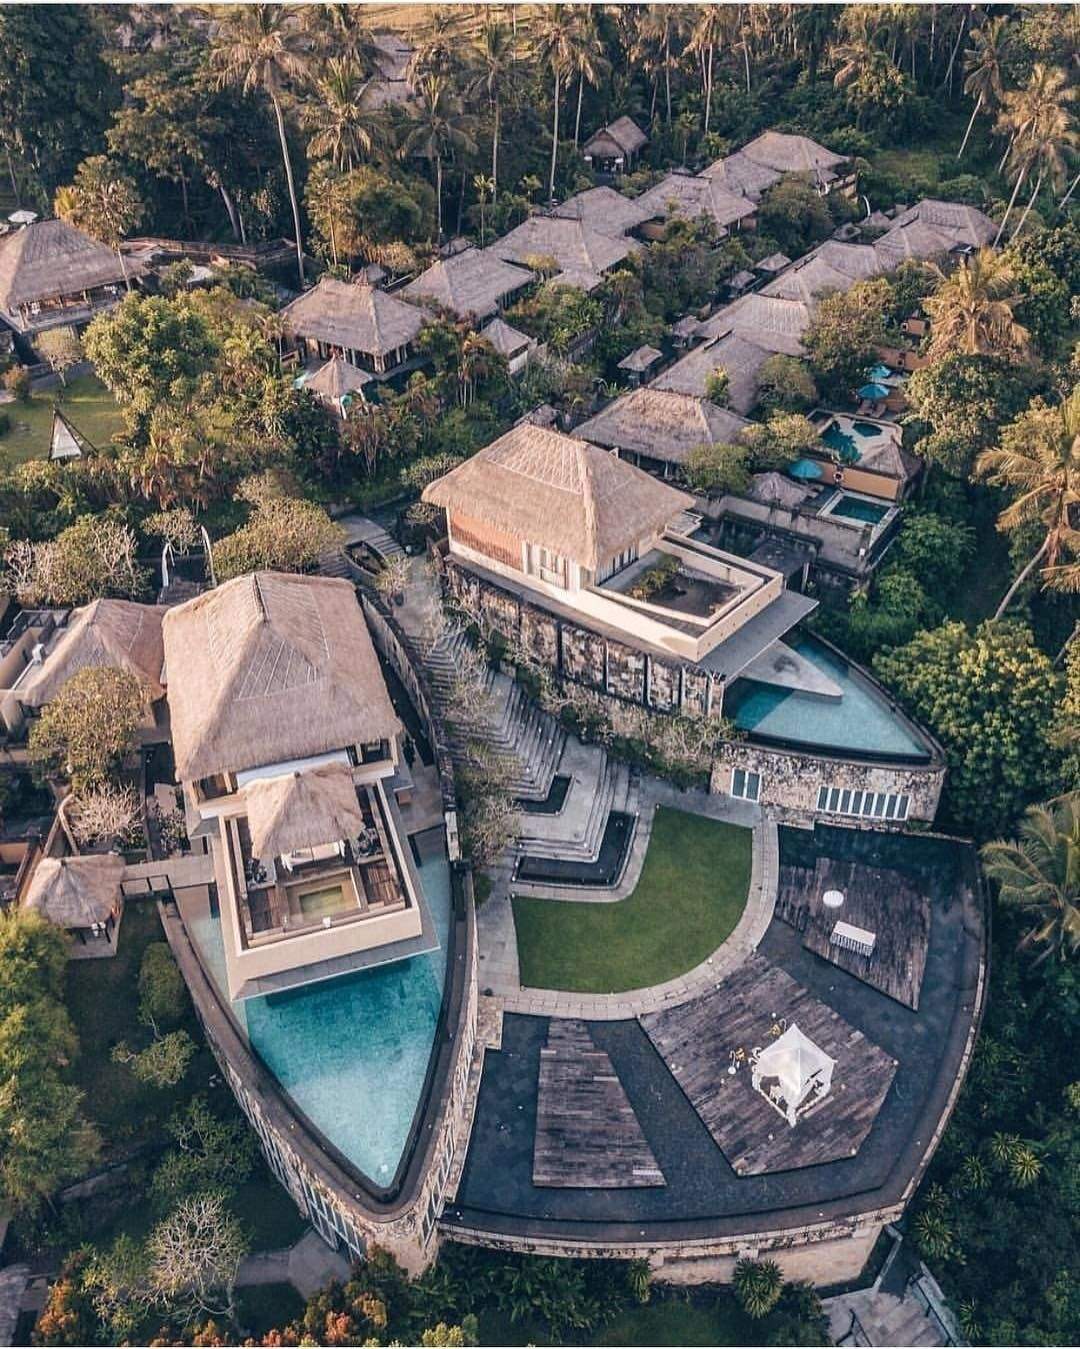 Kamandalu ubud bali resort pools in 2019 bali for Design hotel ubud